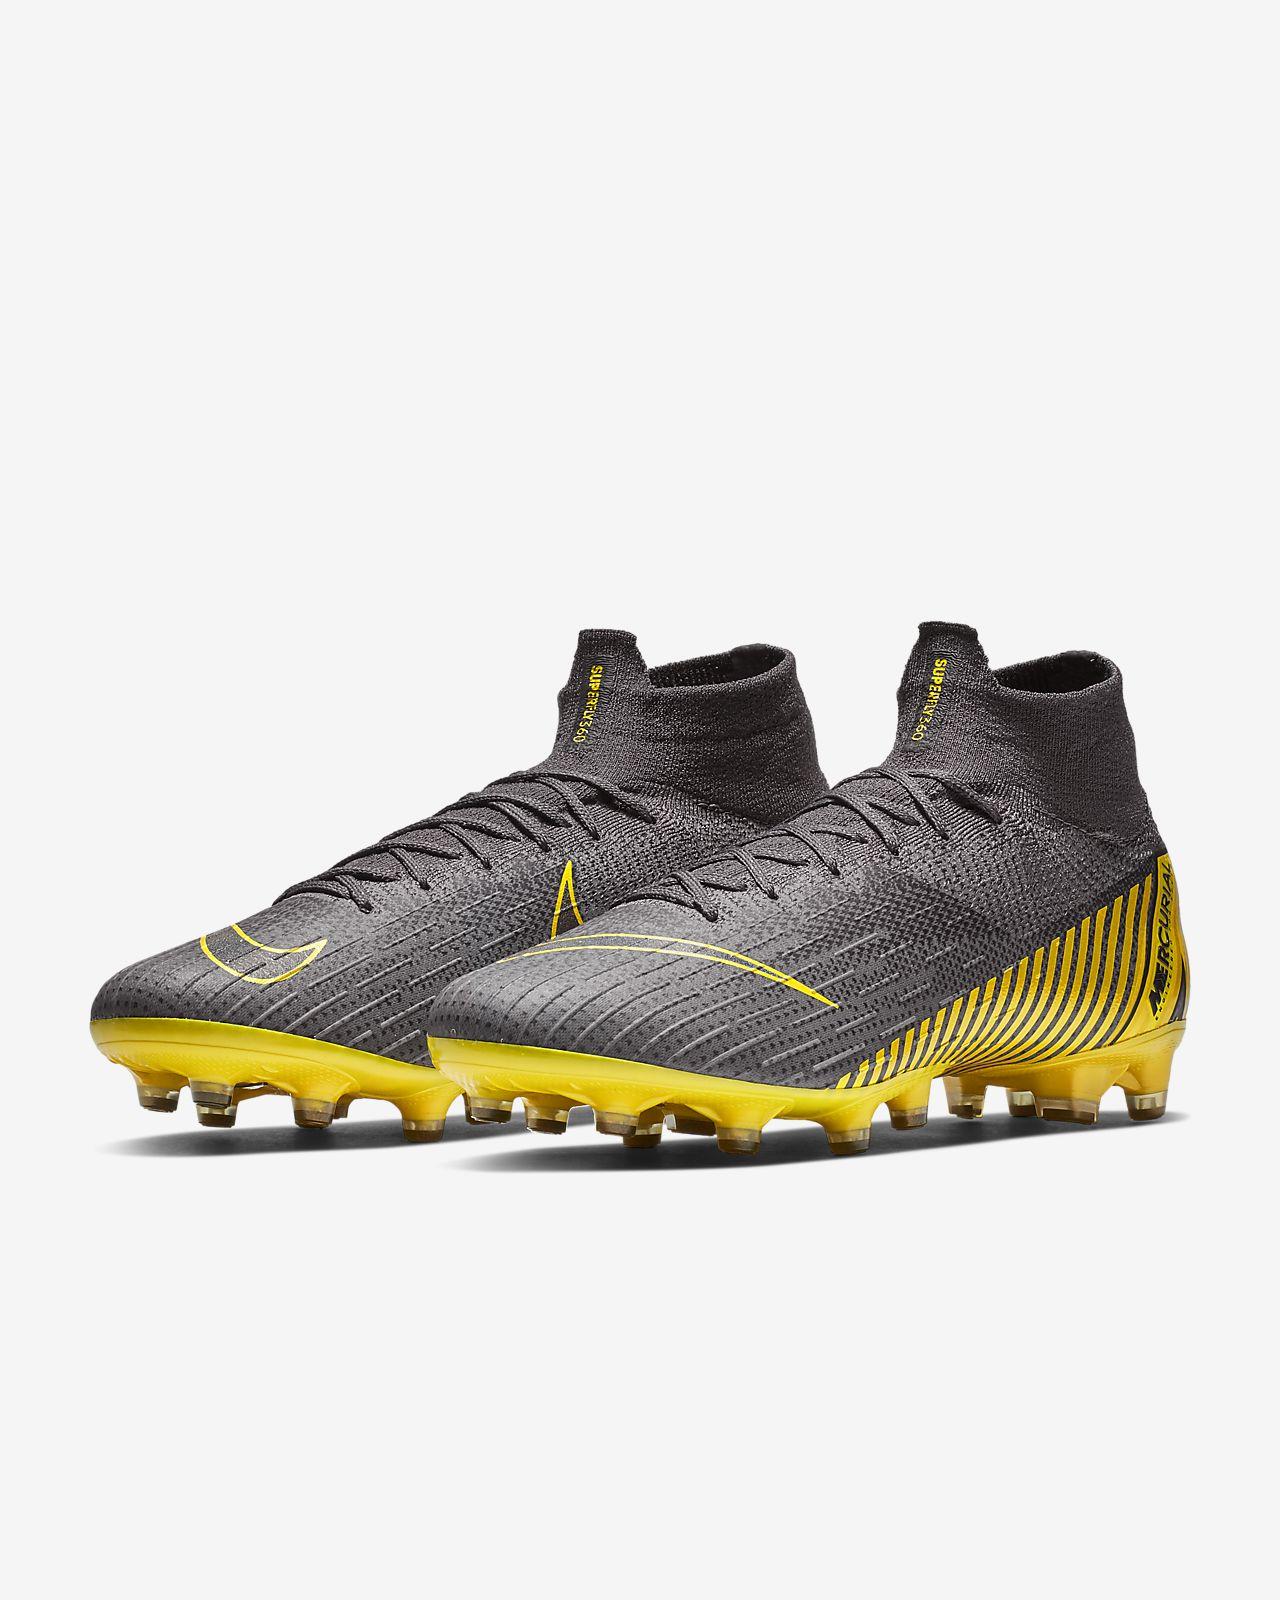 Chaussure De À Elite Pour Terrain Mercurial Superfly Synthétique 360 Nike Pro Football Ag Crampons iOPZTkXu